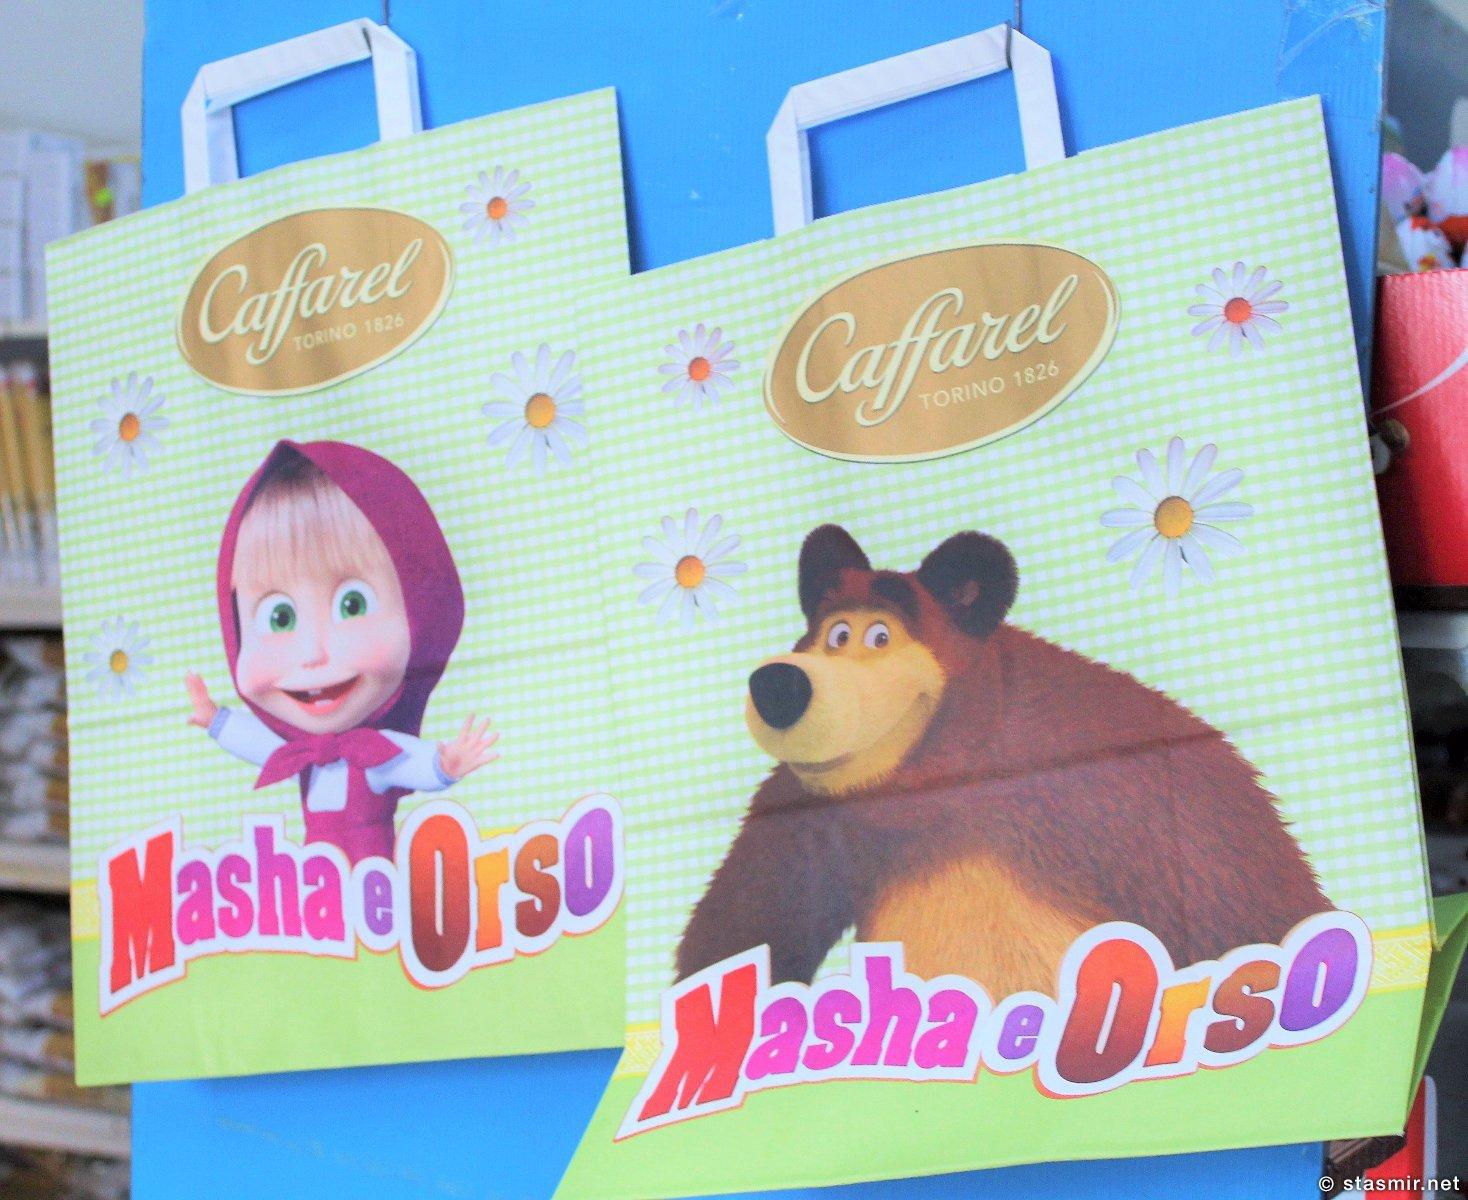 Локоротондо, Апулия, Masha e Orso, Маша и Медведь, фото Стасмир, photo Stasmir